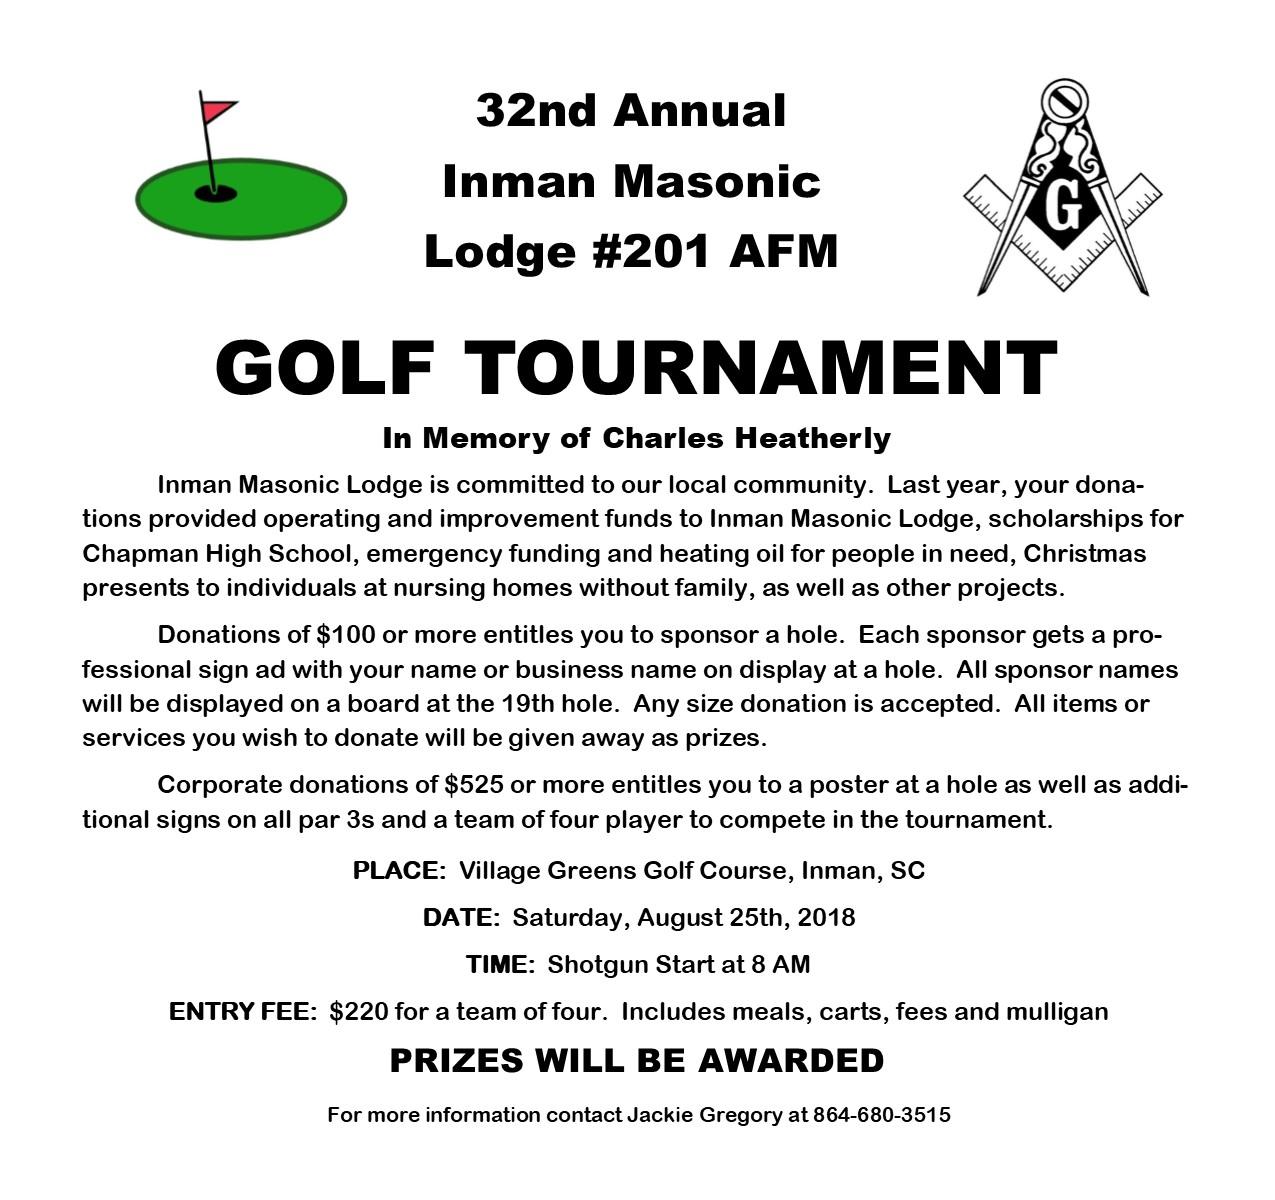 Golf Tournament Newsletter Flyer.jpg